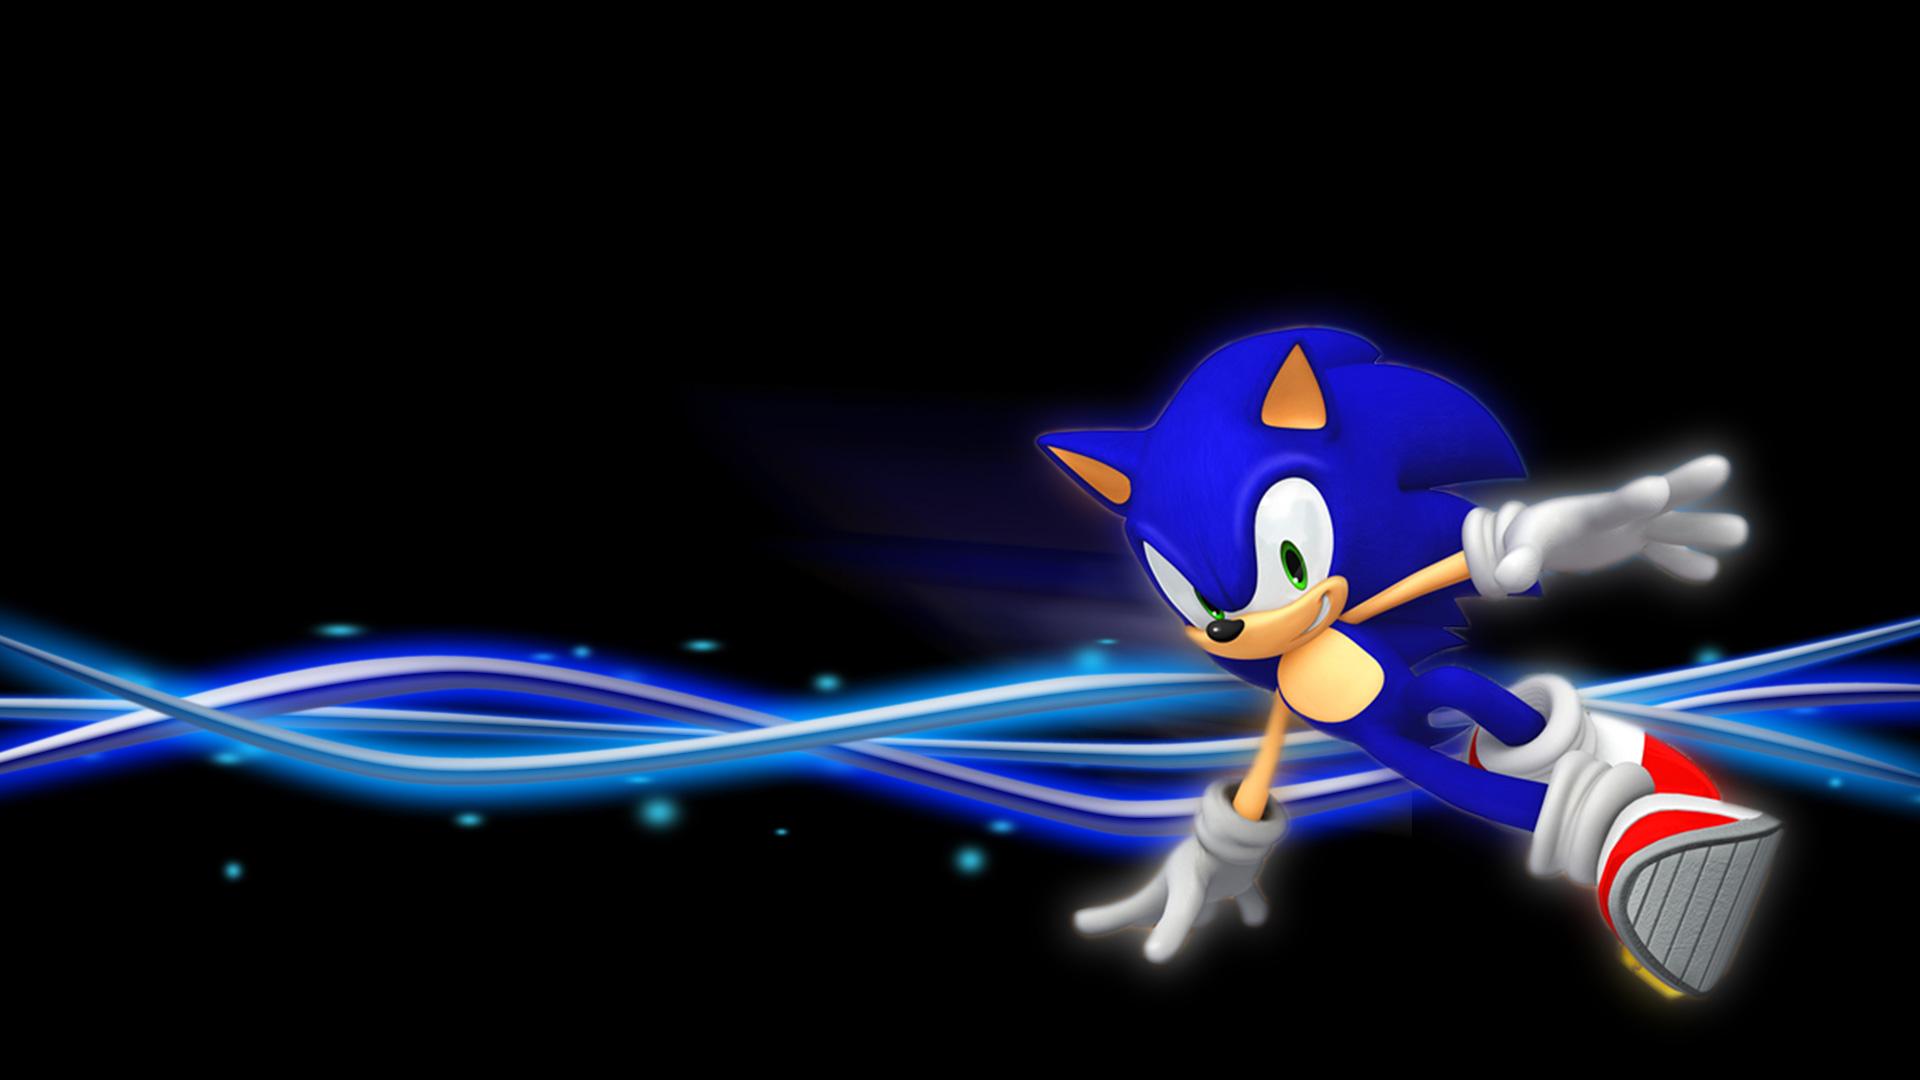 Sonic The Hedgehog 4 Episode I y II [userscloud] PC